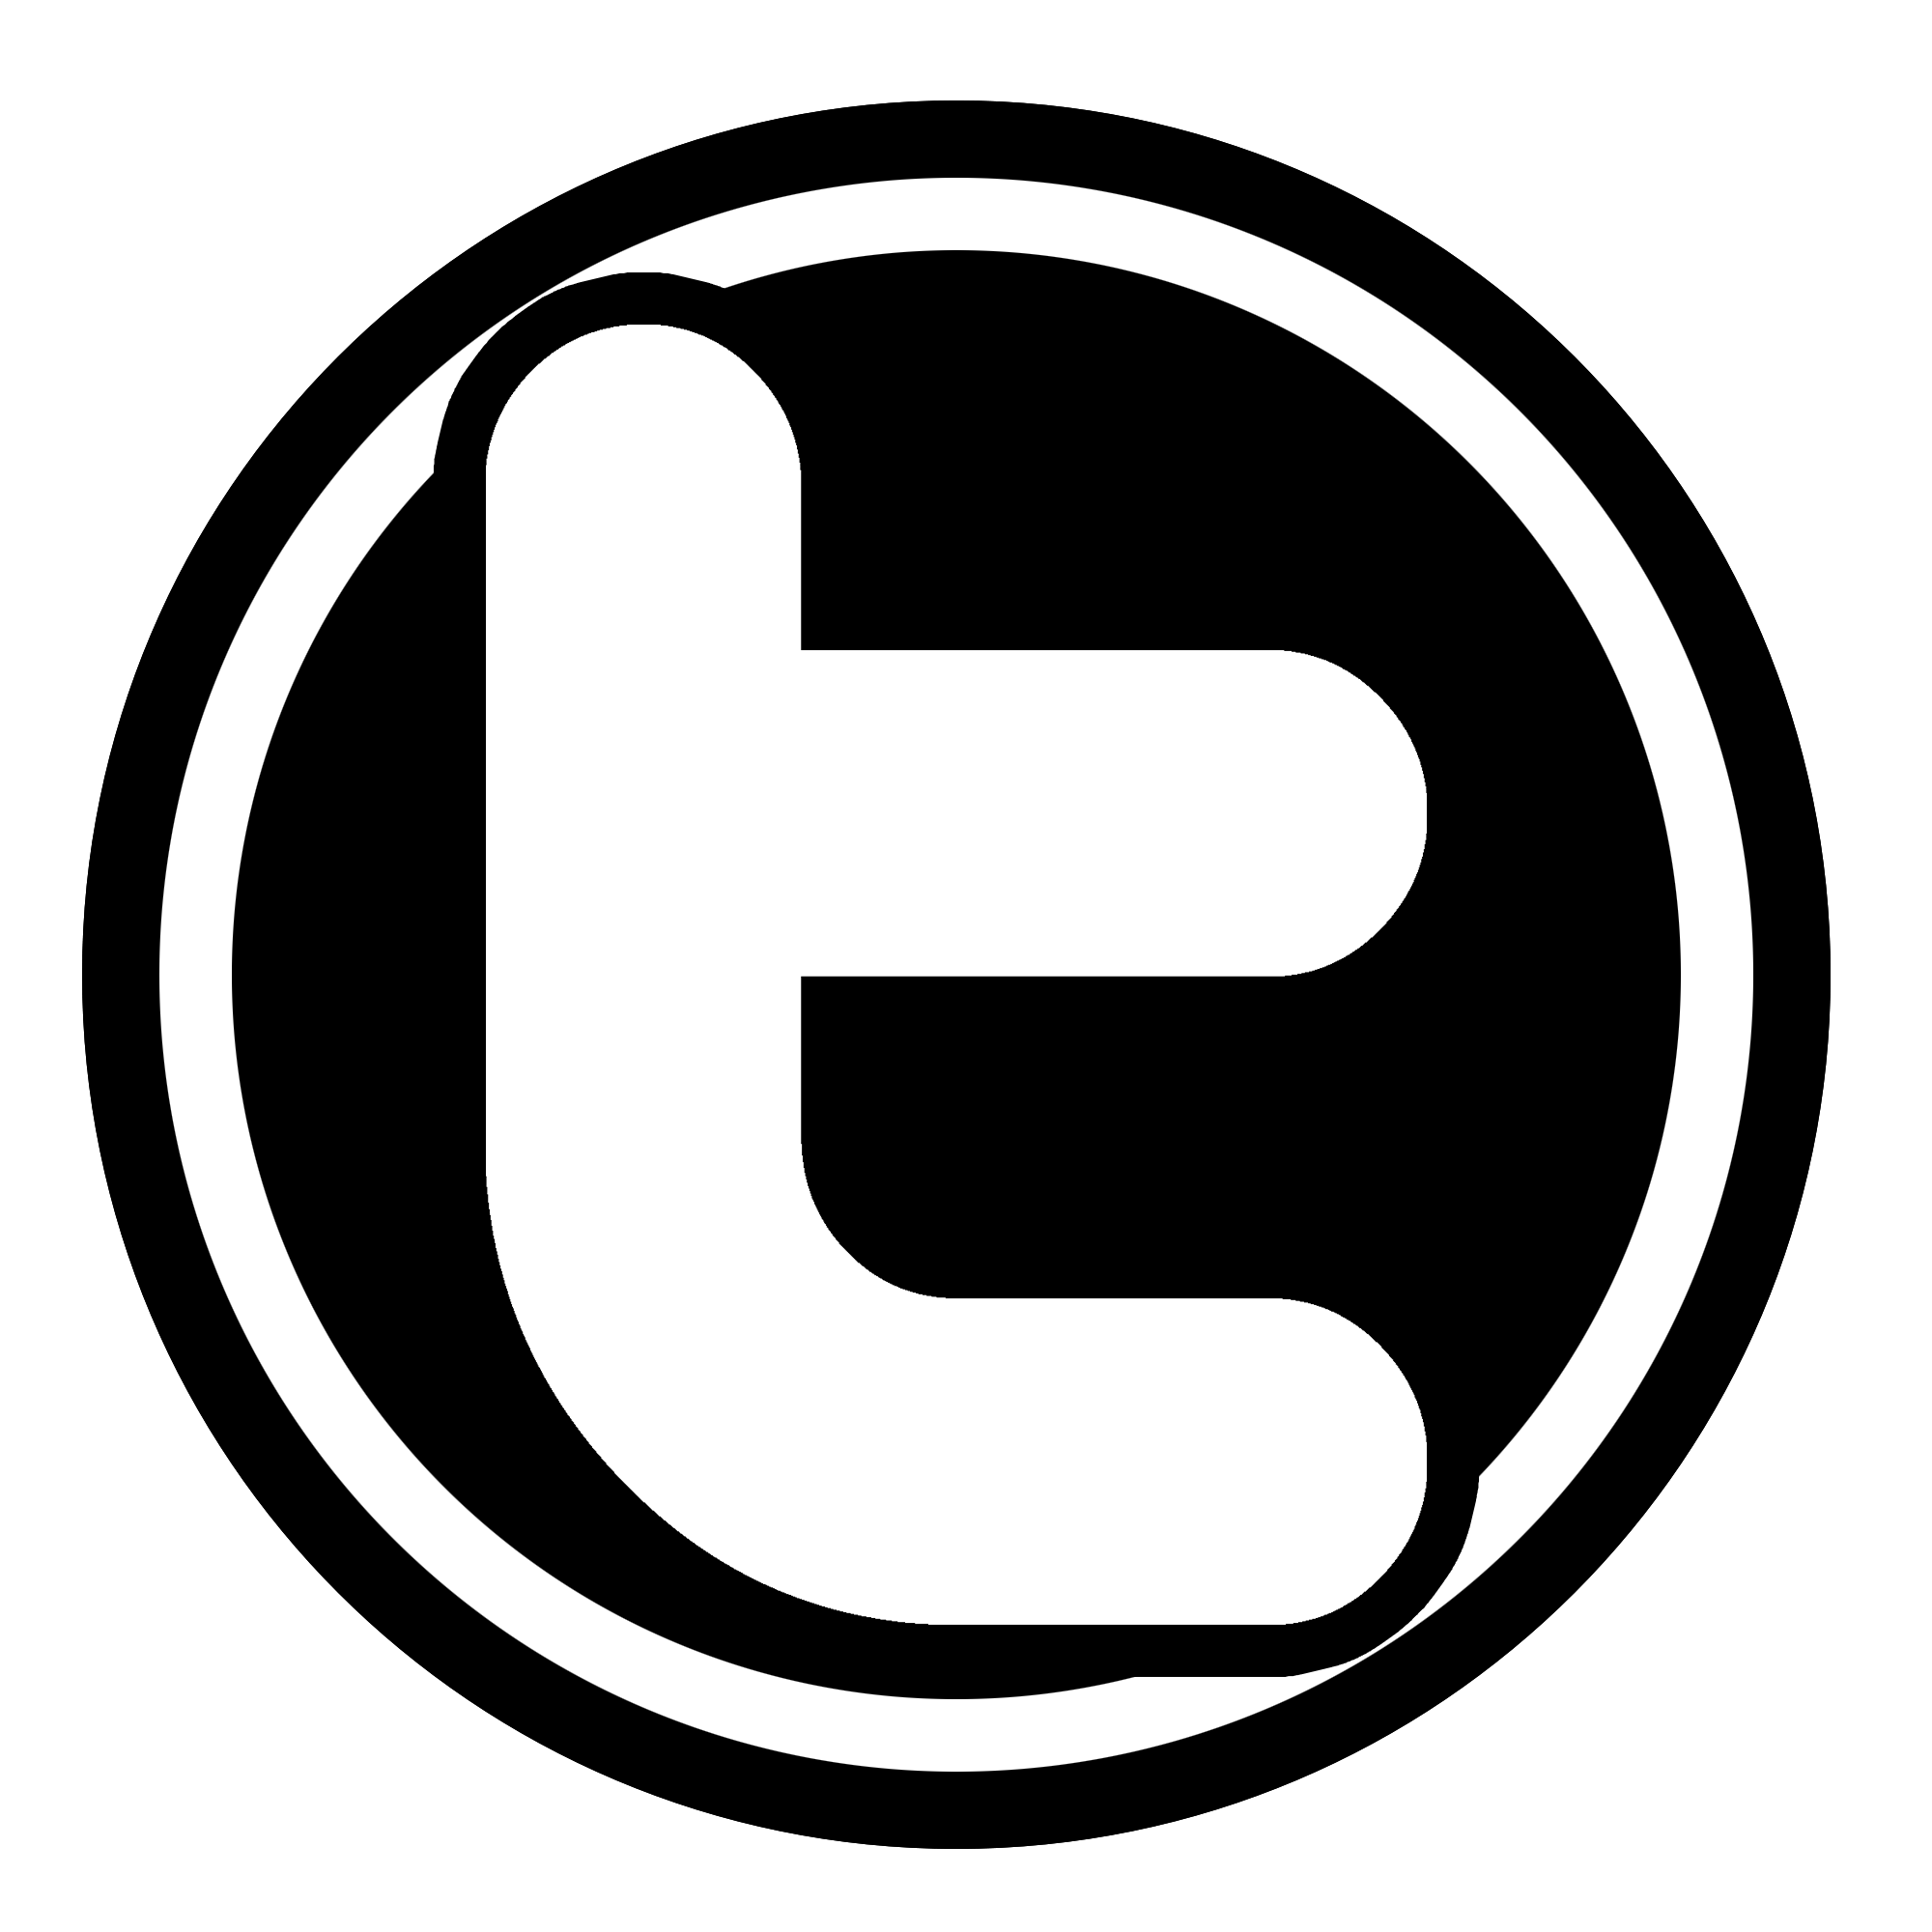 Twitter icon png black. File b w wikimedia